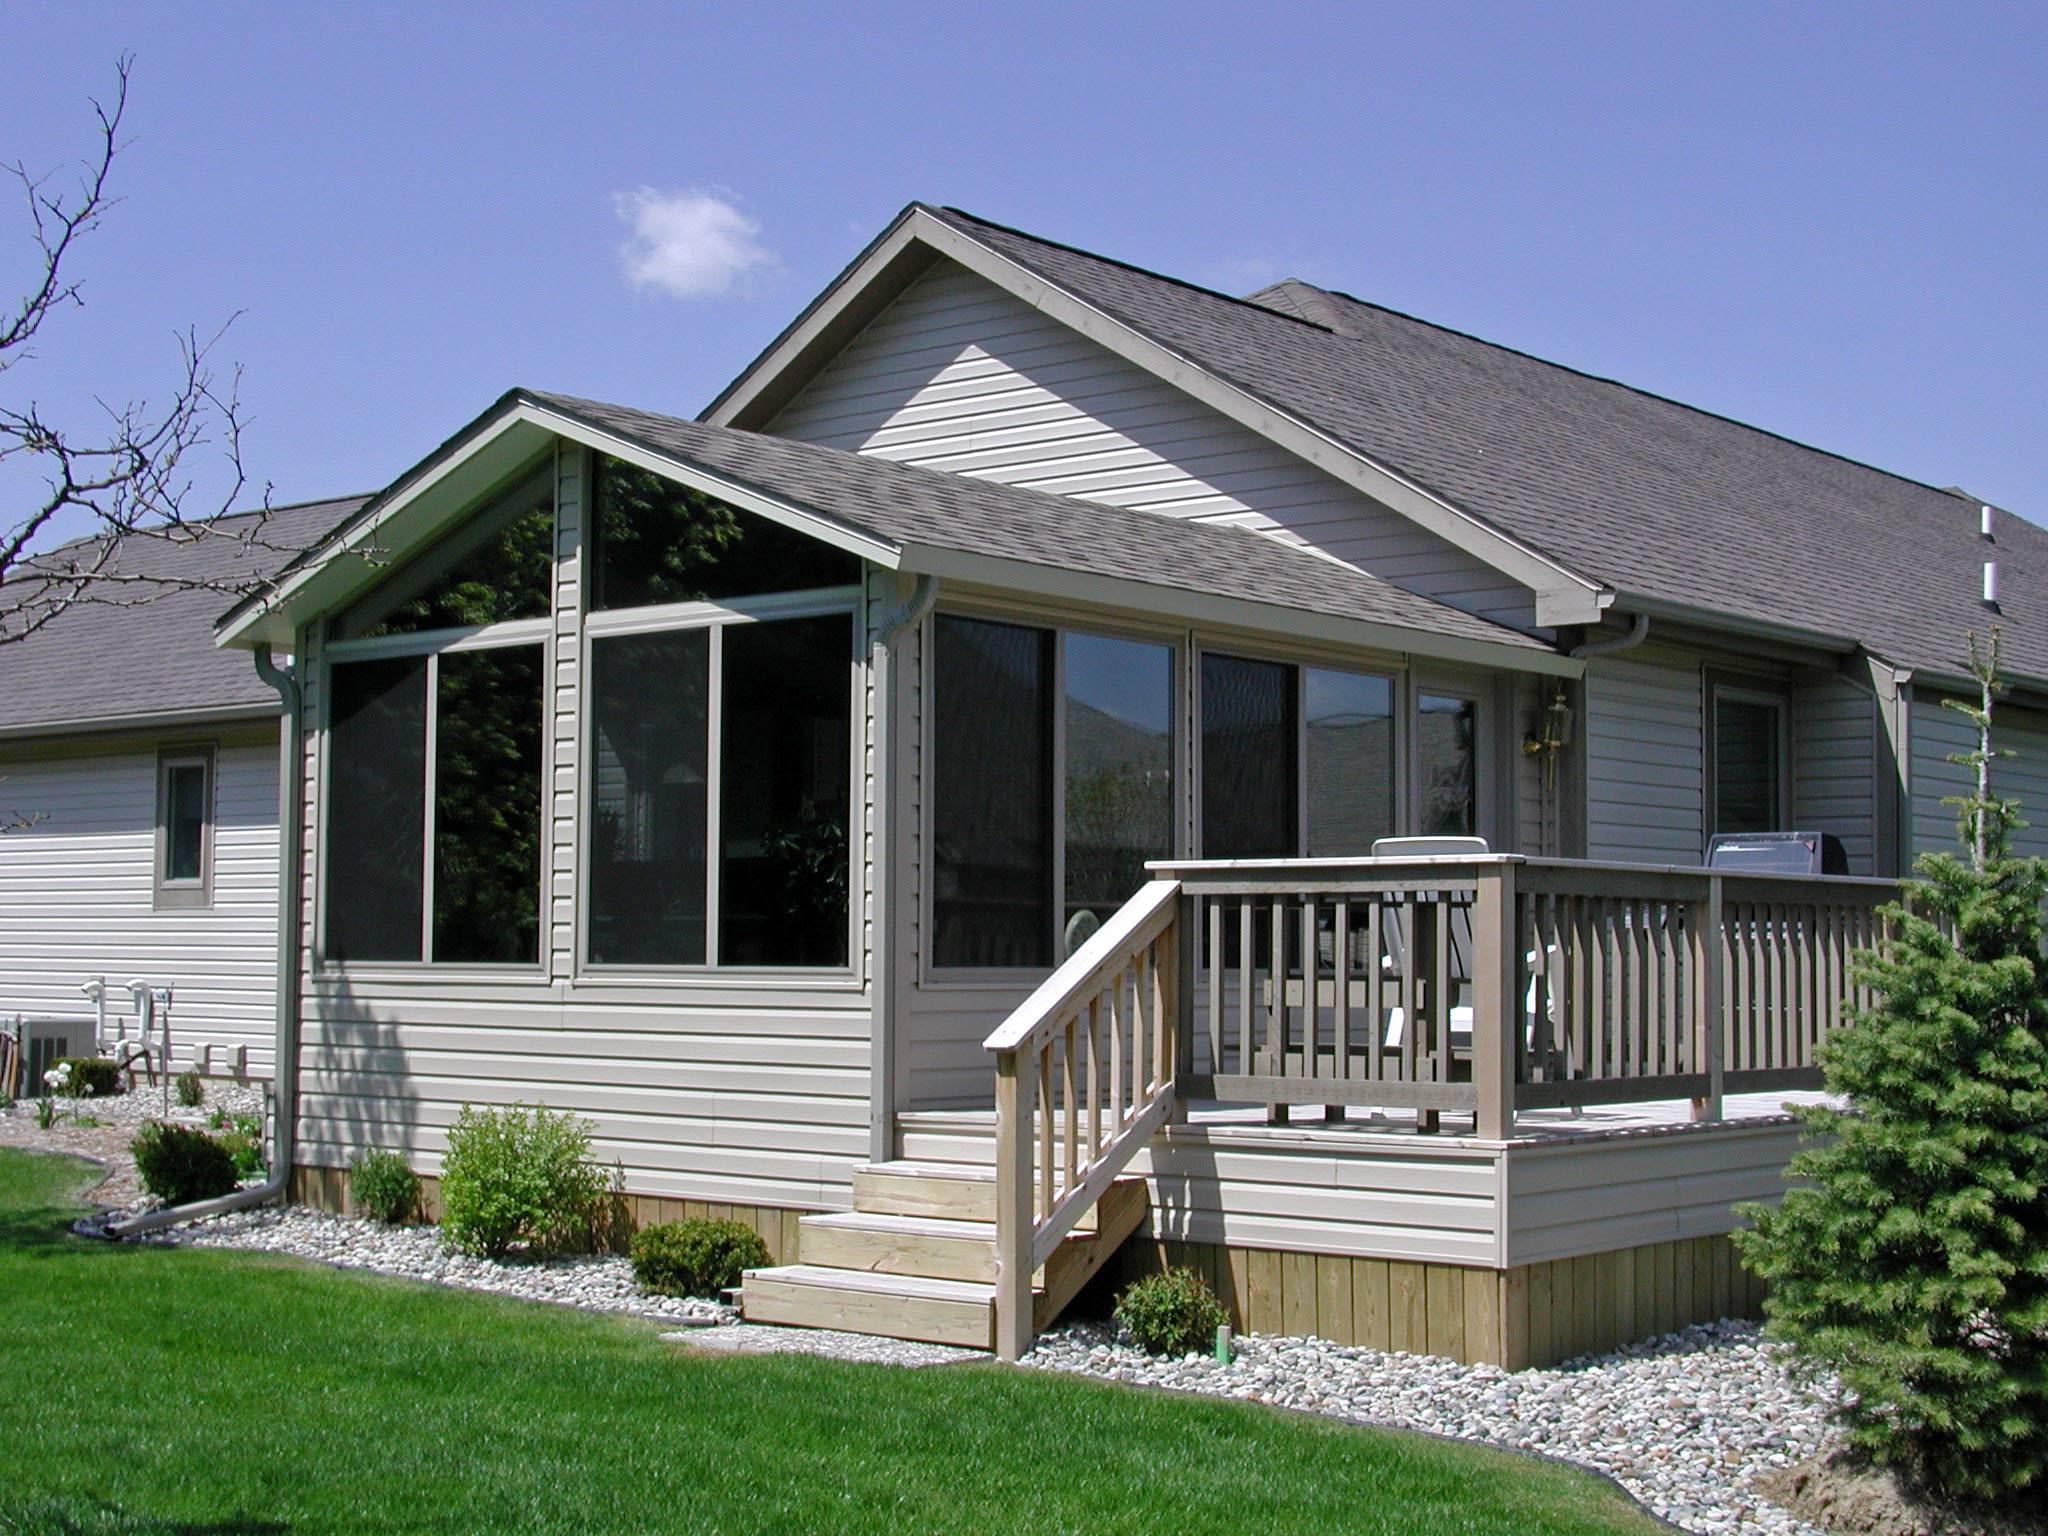 Double gable roof design sunroom vinyl house plans 84409 Single gable roof house plans